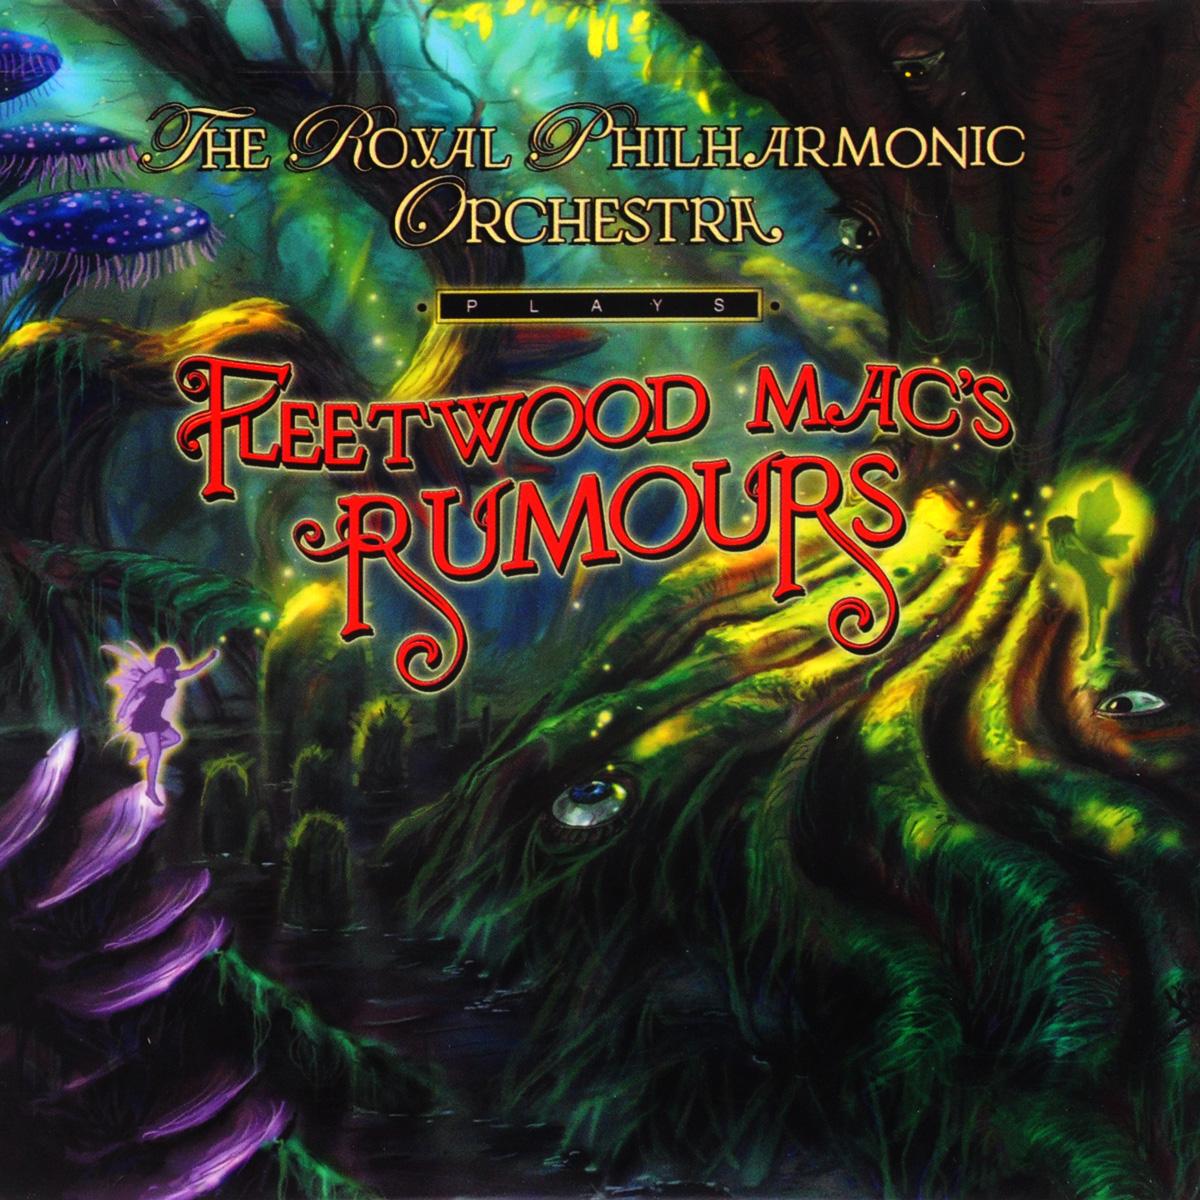 цена на The Royal Philharmonic Orchestra,Питер Фрамптон The Royal Philharmonic Orchestra. Plays Fleetwood Mac's Rumours